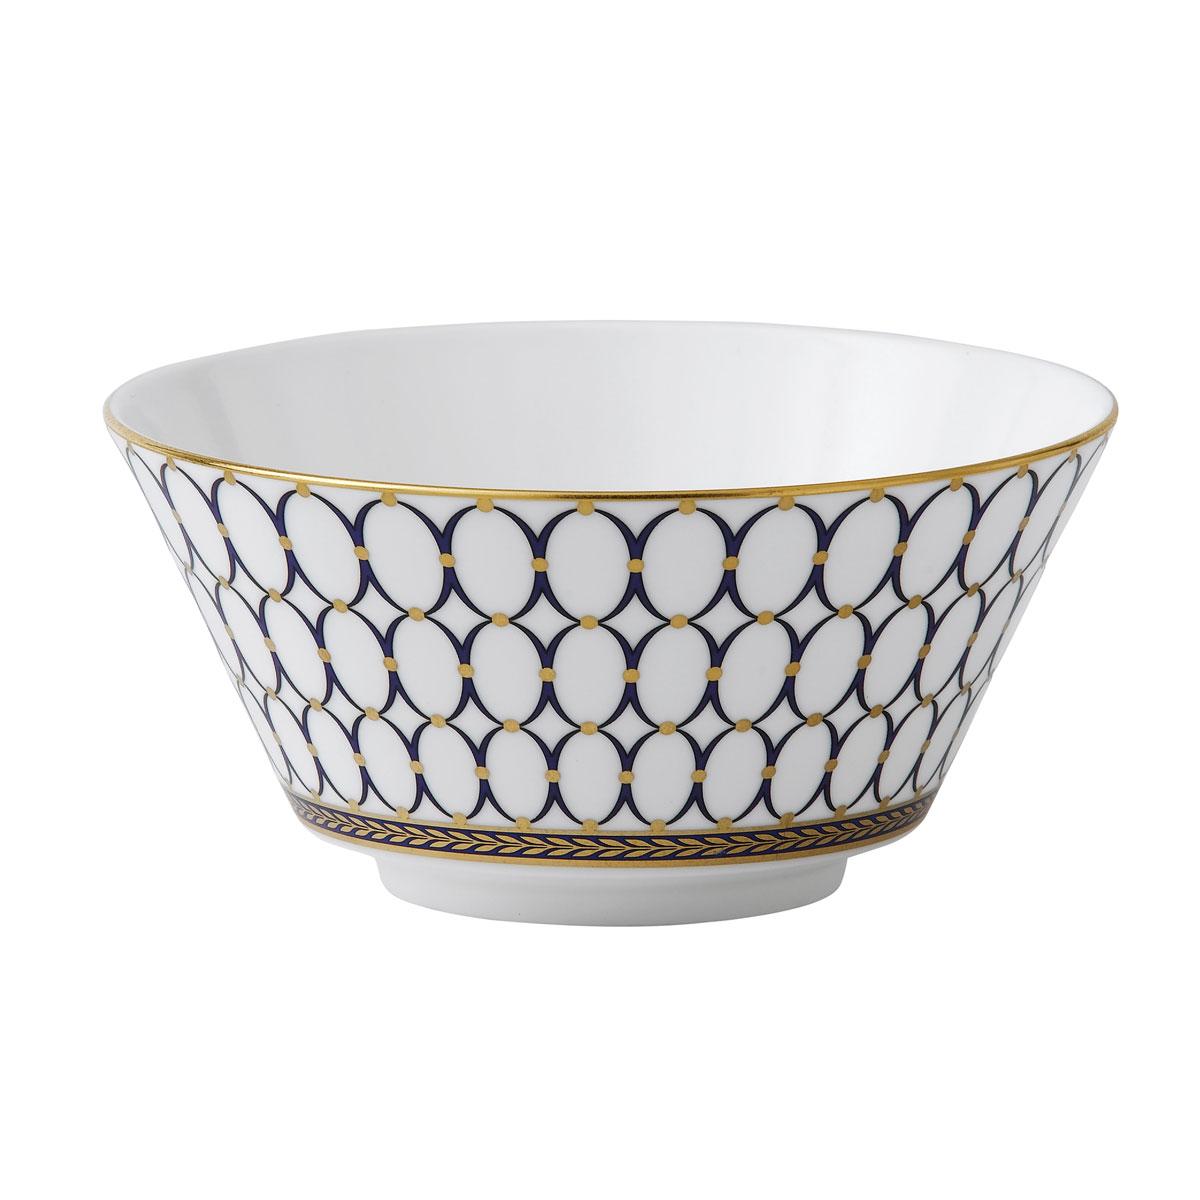 Wedgwood Dinnerware Renaissance Gold Soup/Cereal Bowl, Single